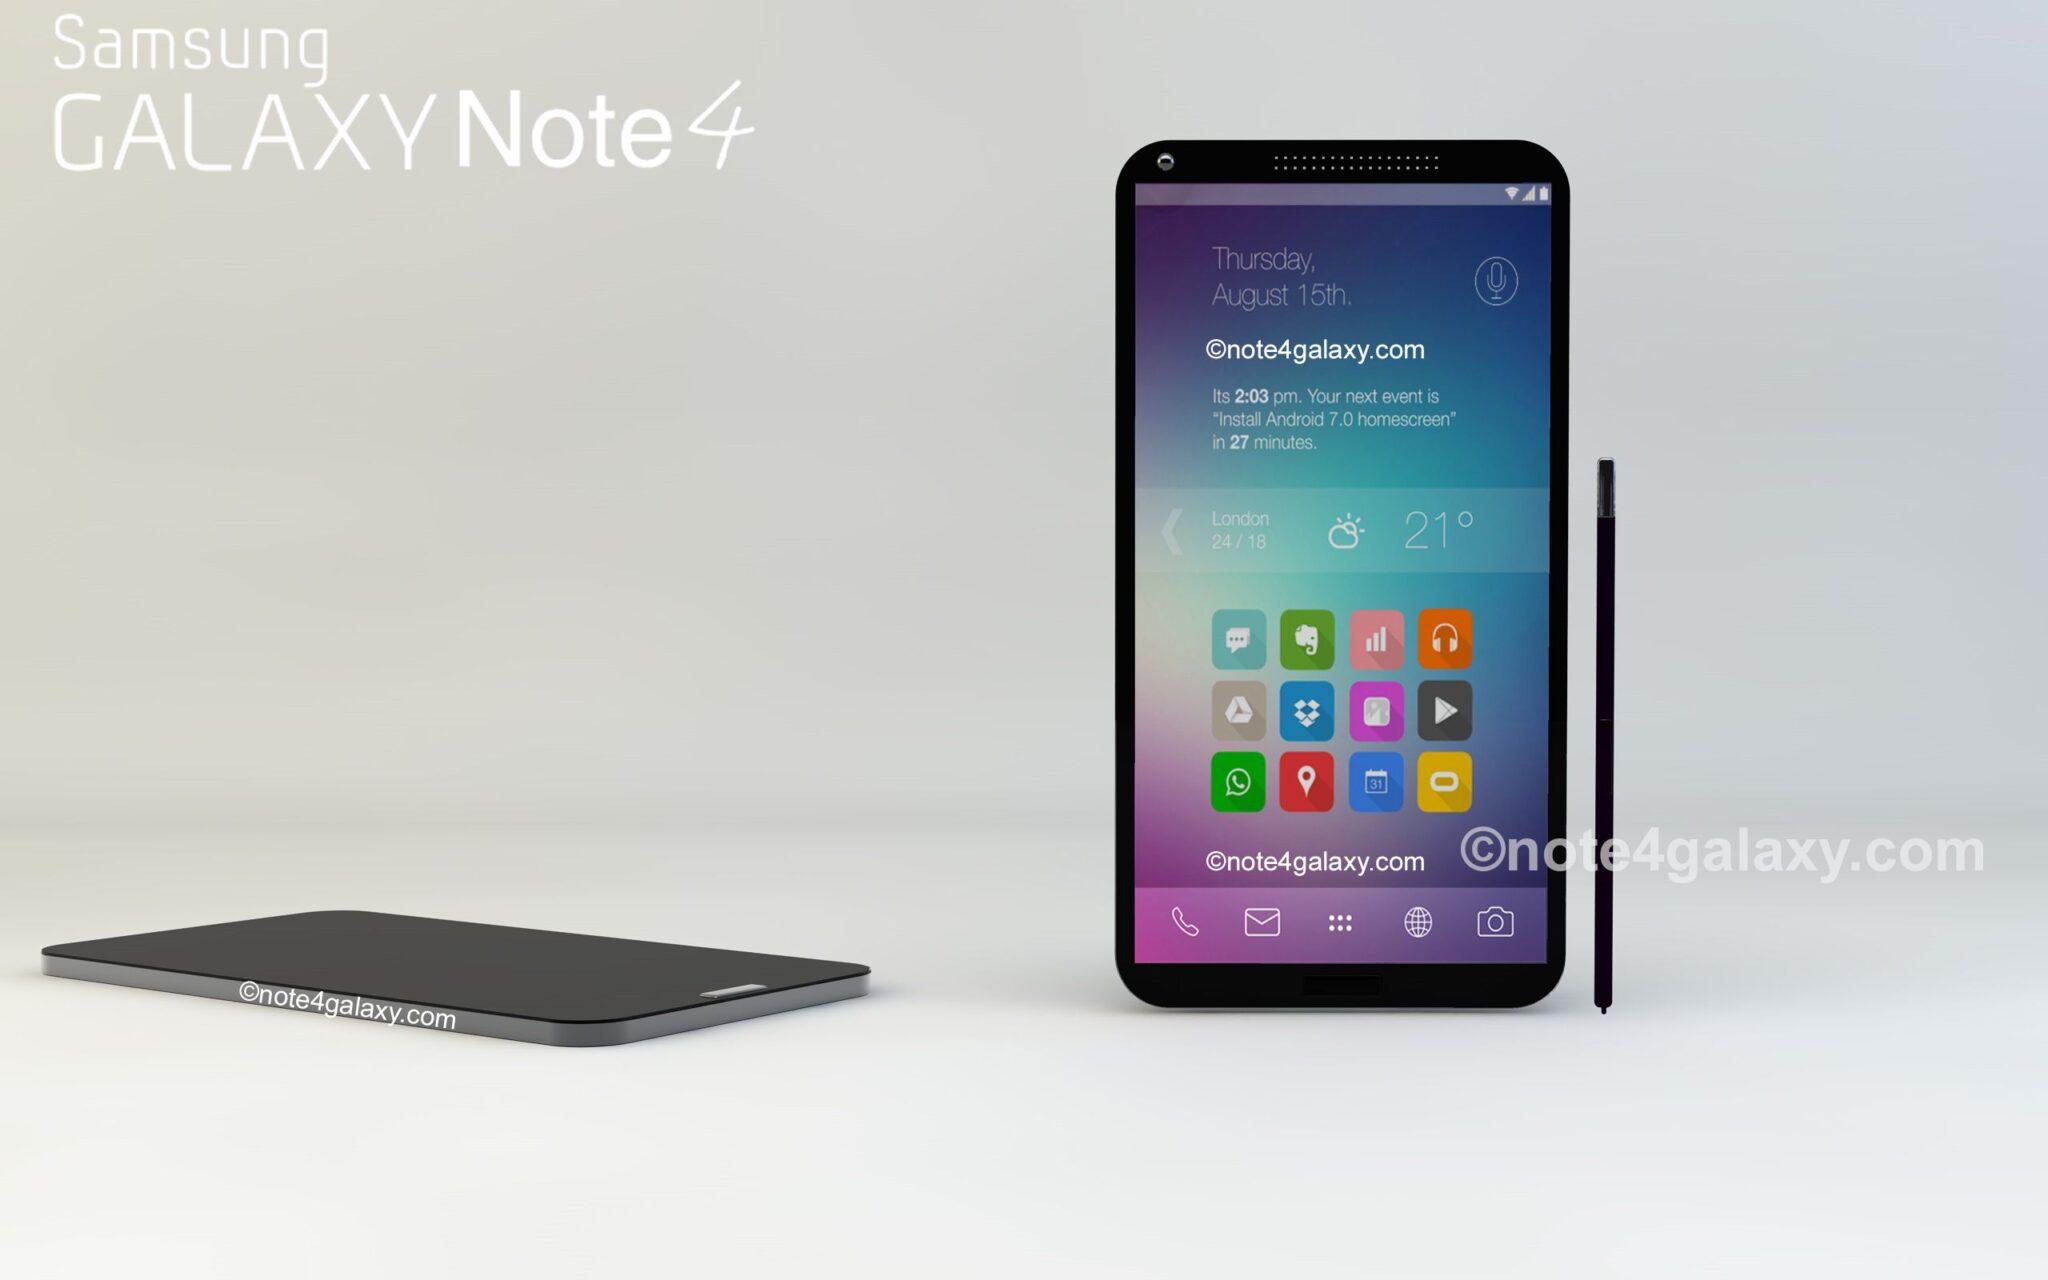 Galaxy note 4 conceptGalaxy Note 4 Concept